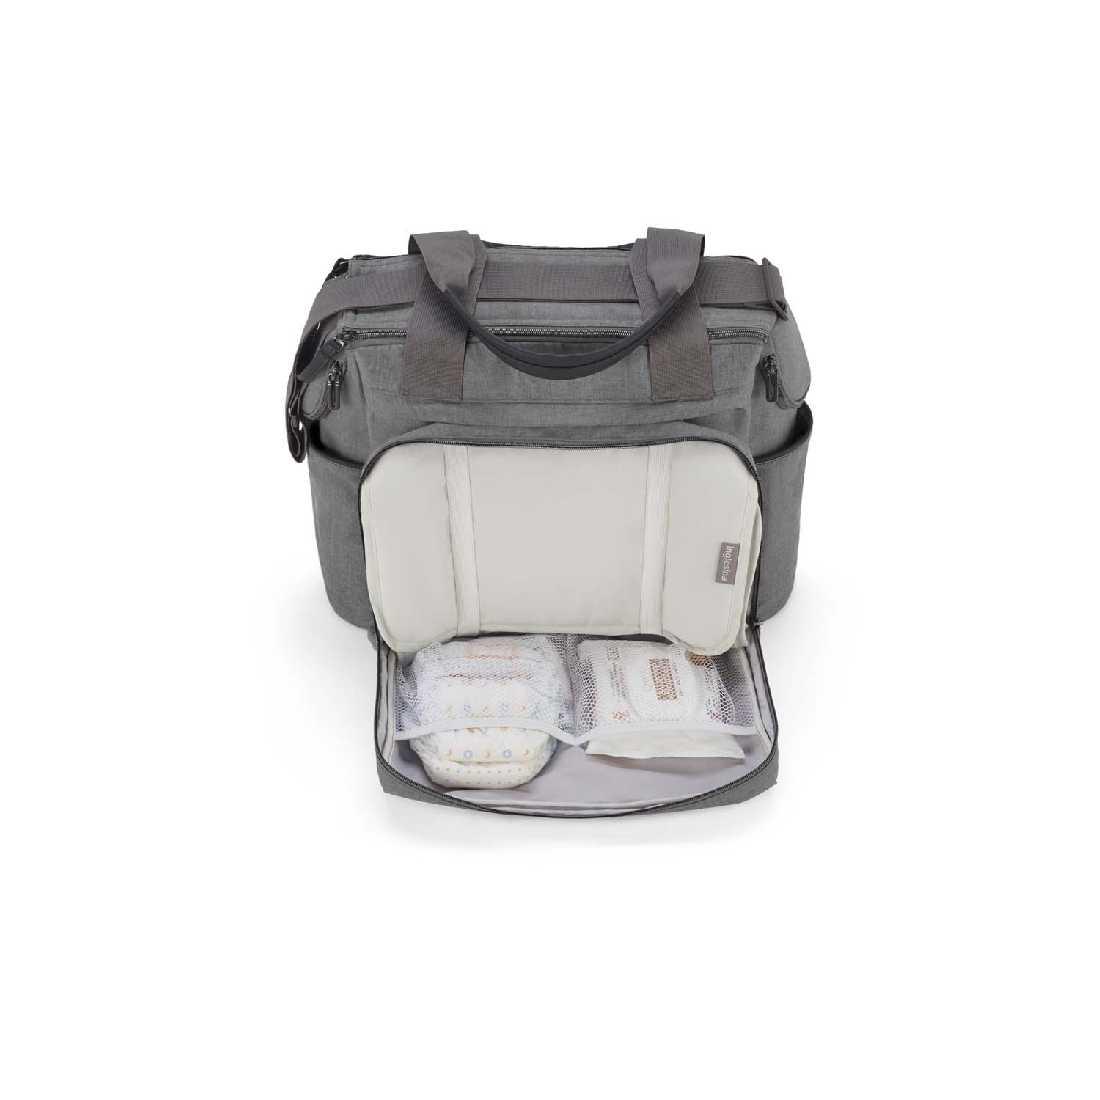 Detalles-interior-bolso-aptica-dual-bag